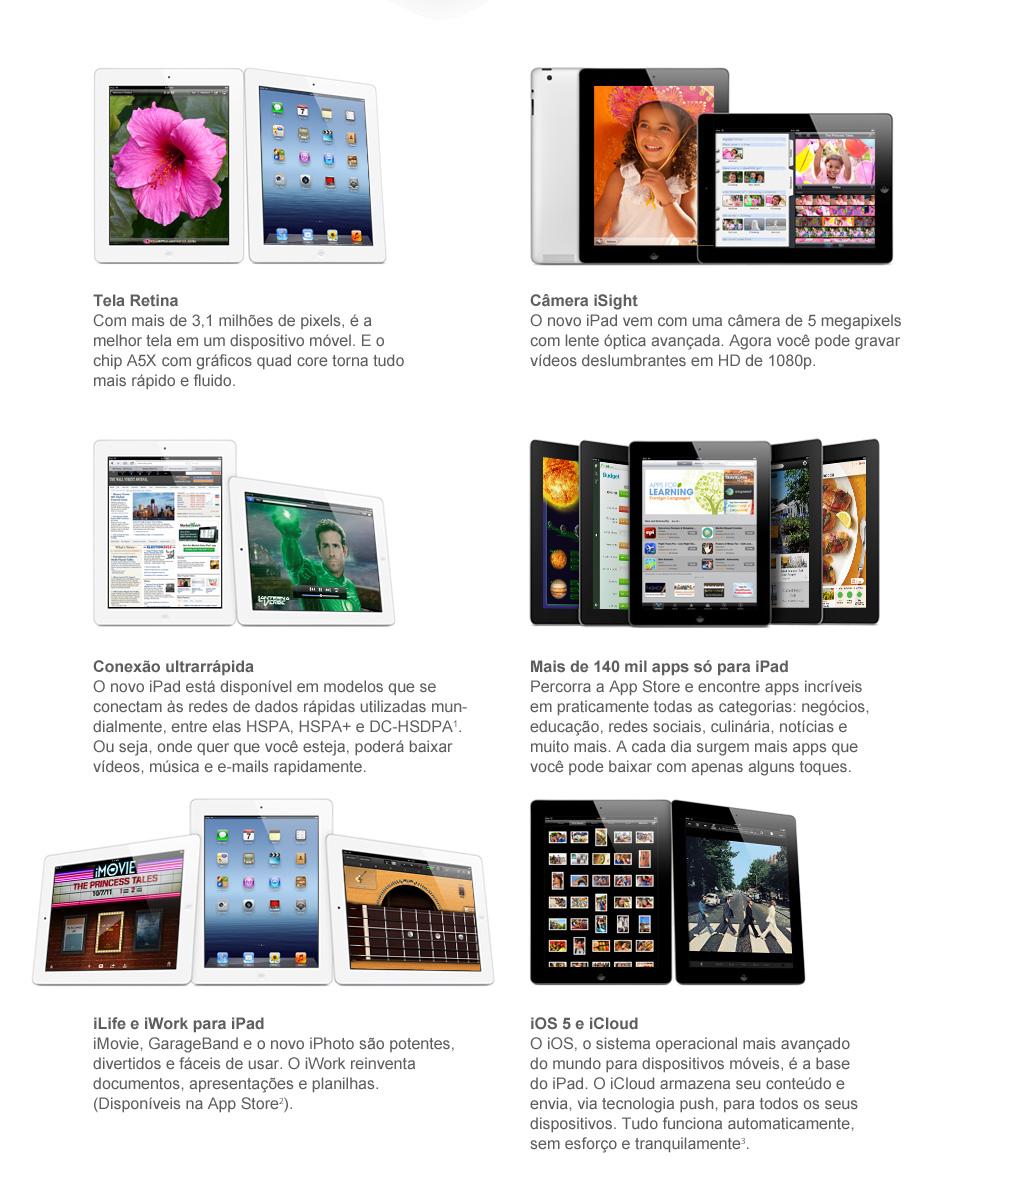 Novo iPad 3 chegou! Compre agora!